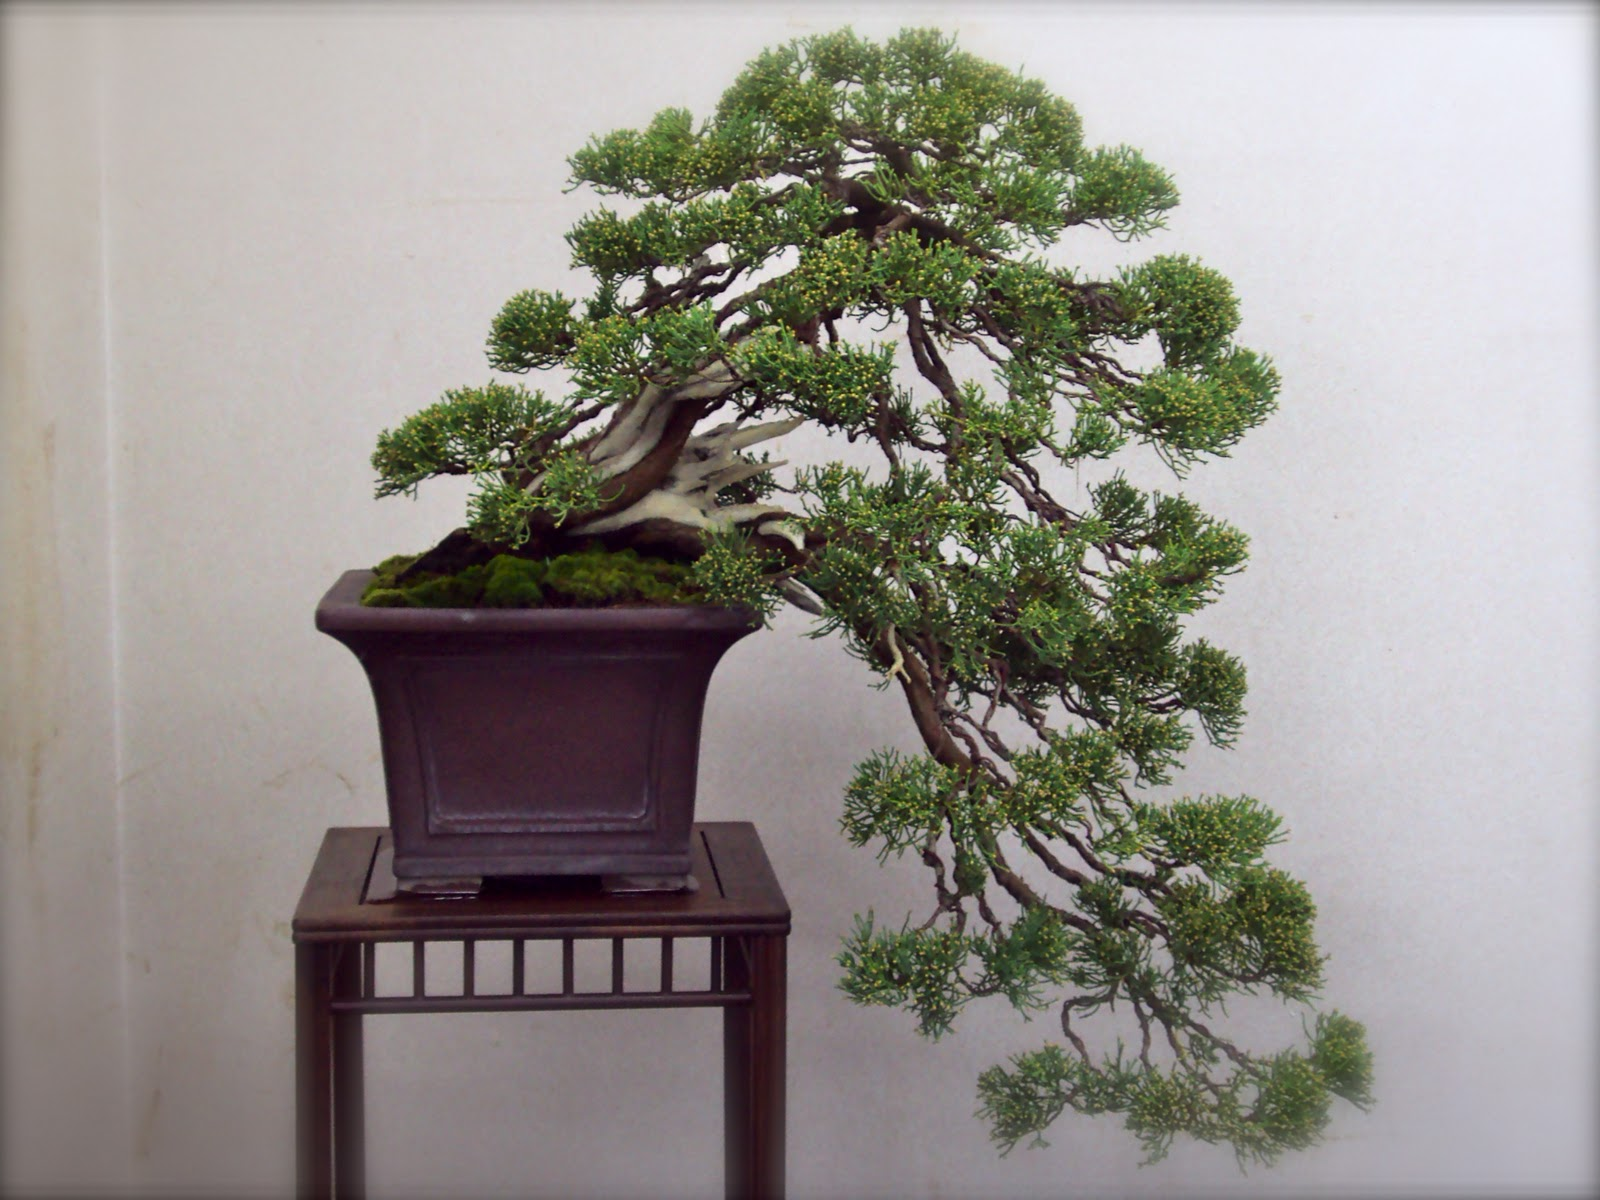 Top unique bonsai trees gallery for Unique bonsai trees